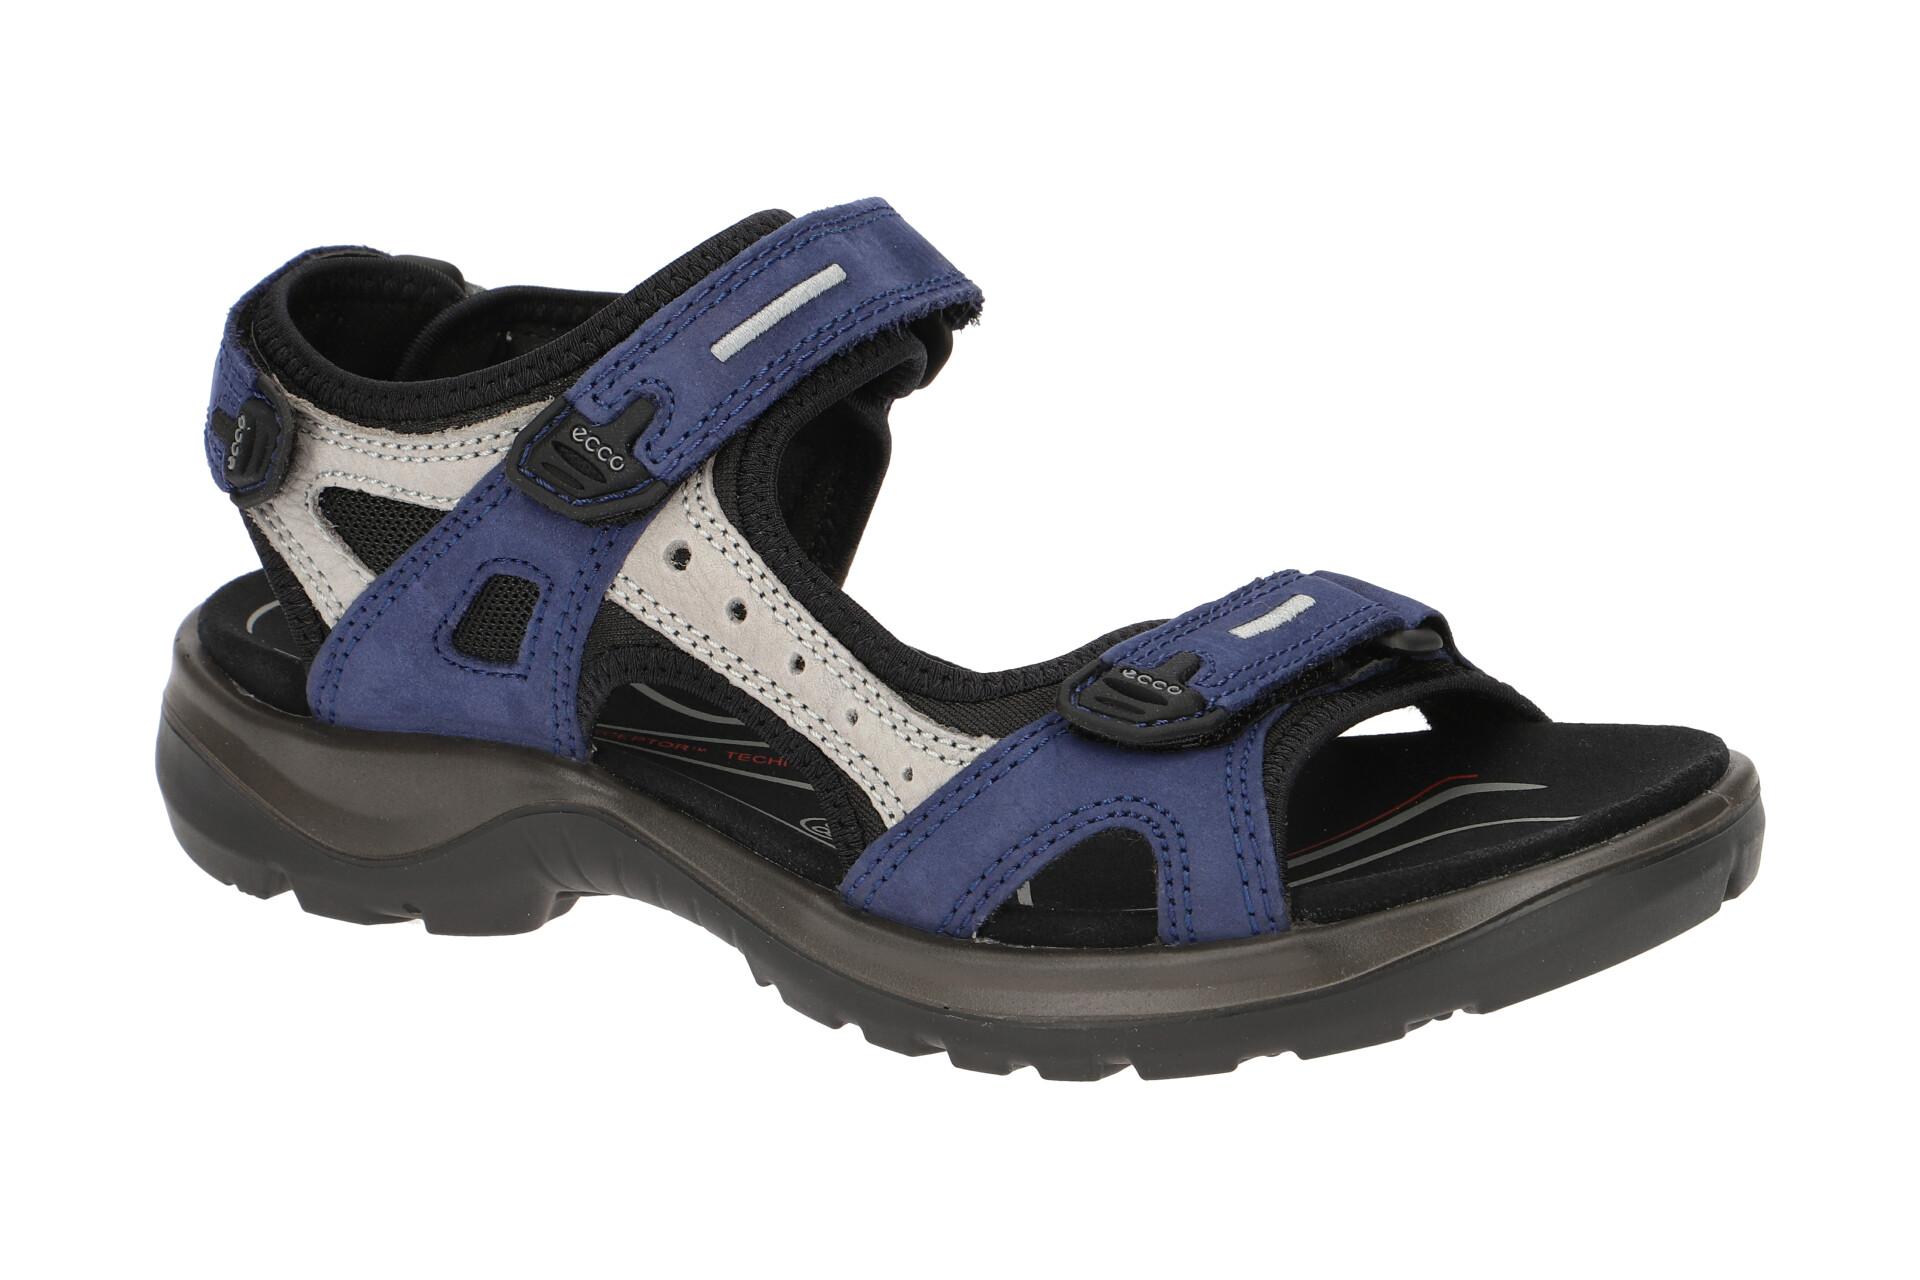 Ecco Offroad Damen Sandale blau grau